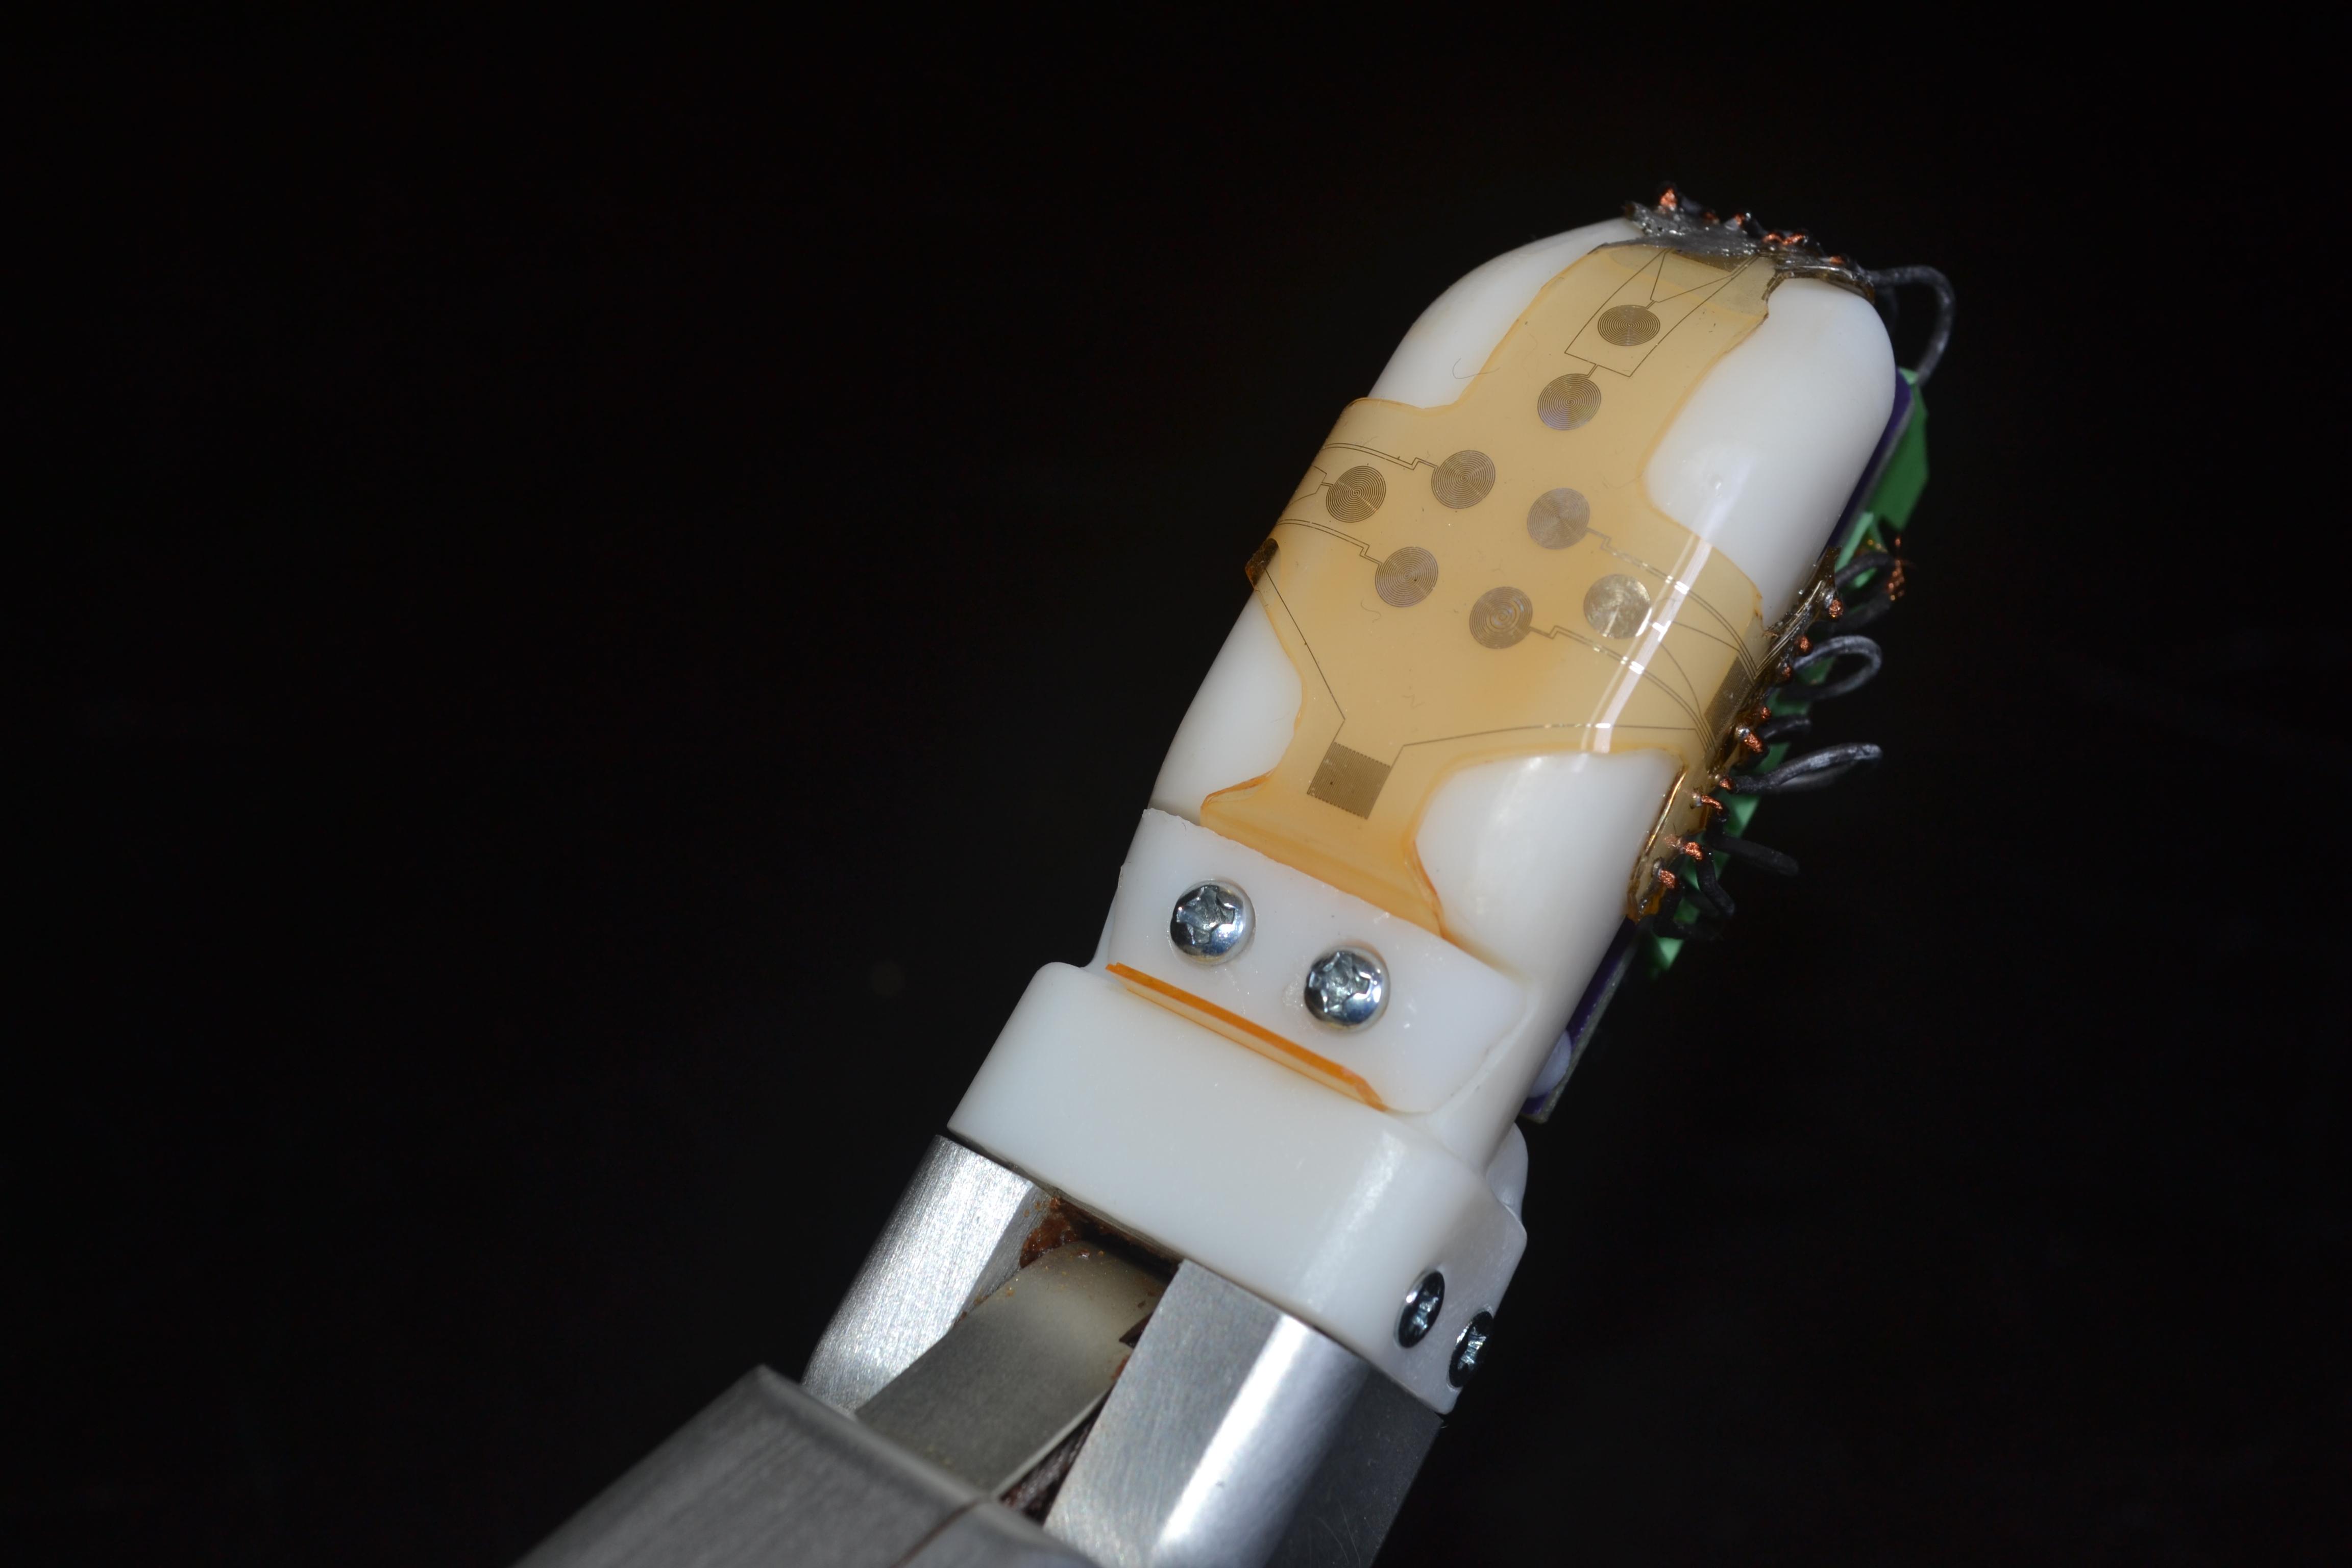 Robothuid